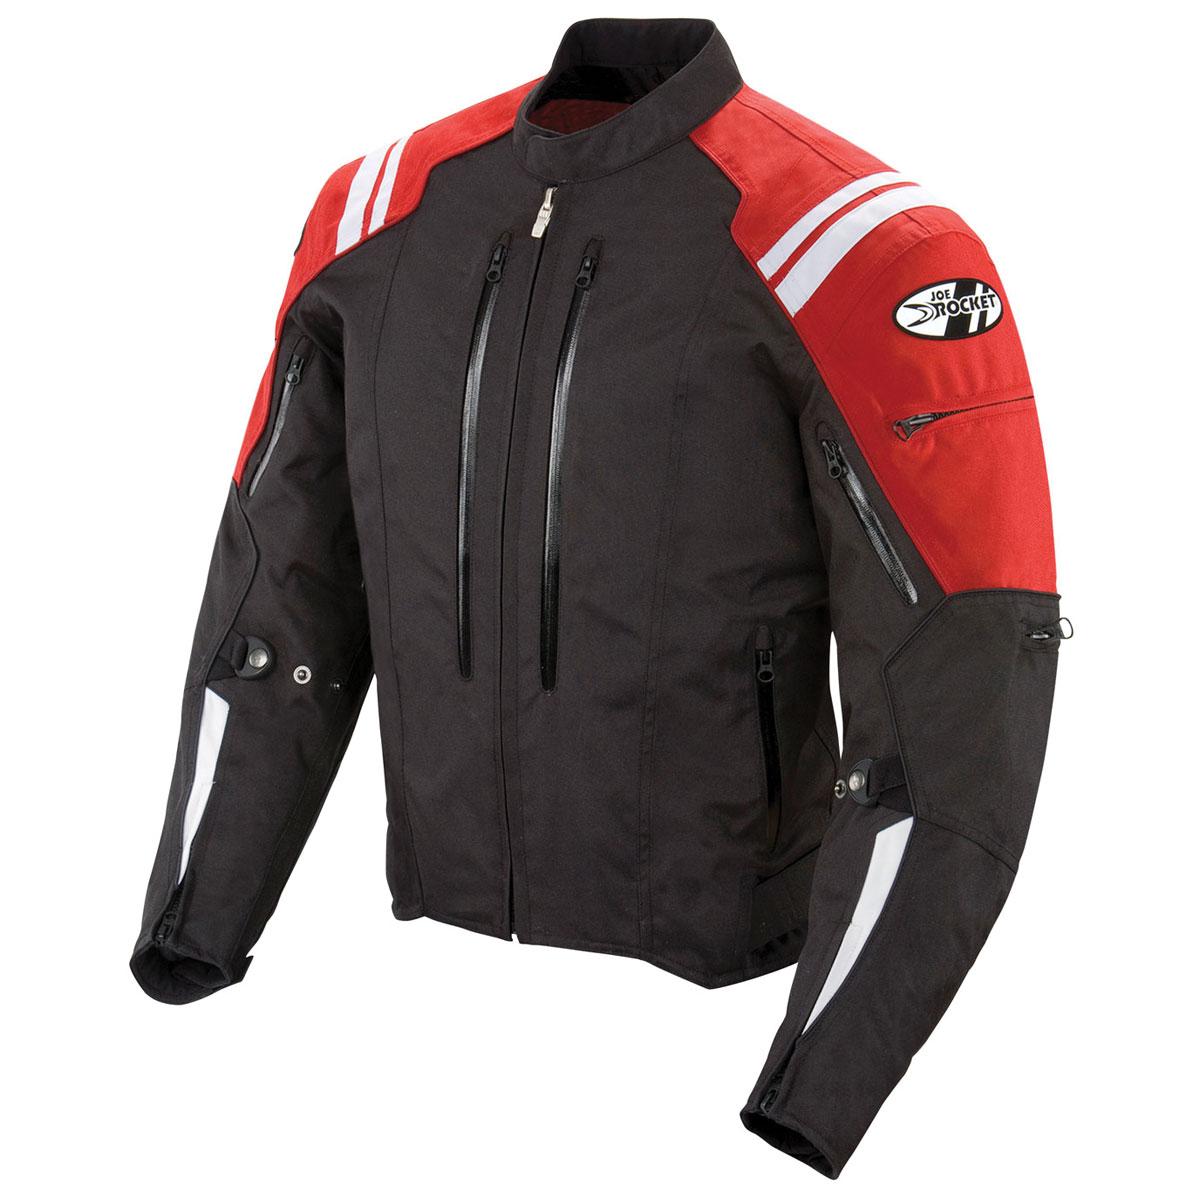 Joe Rocket Men's Atomic 4.0 Waterproof Red/Black Jacket